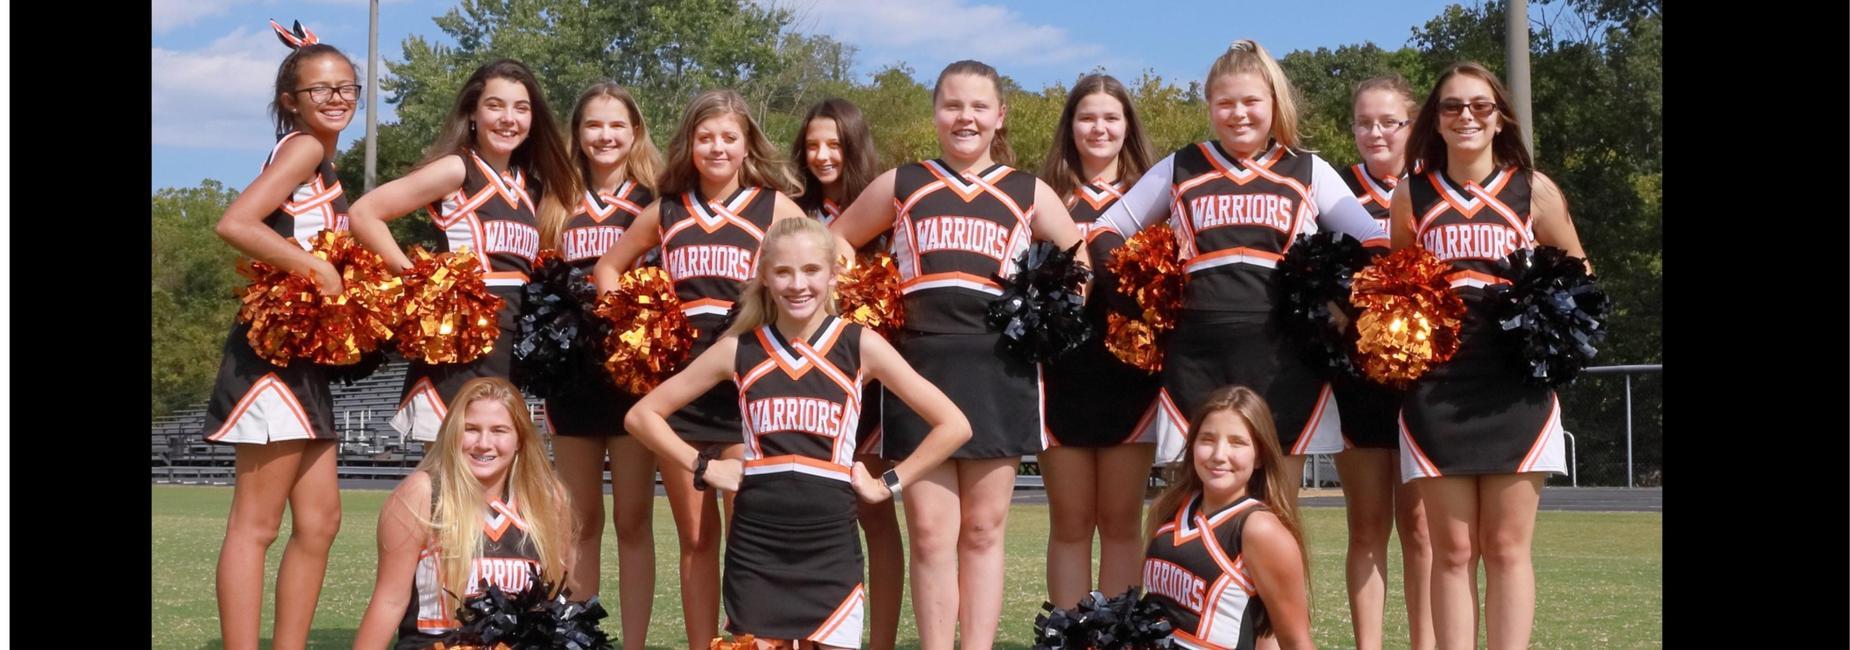 CMS fall cheerleading team